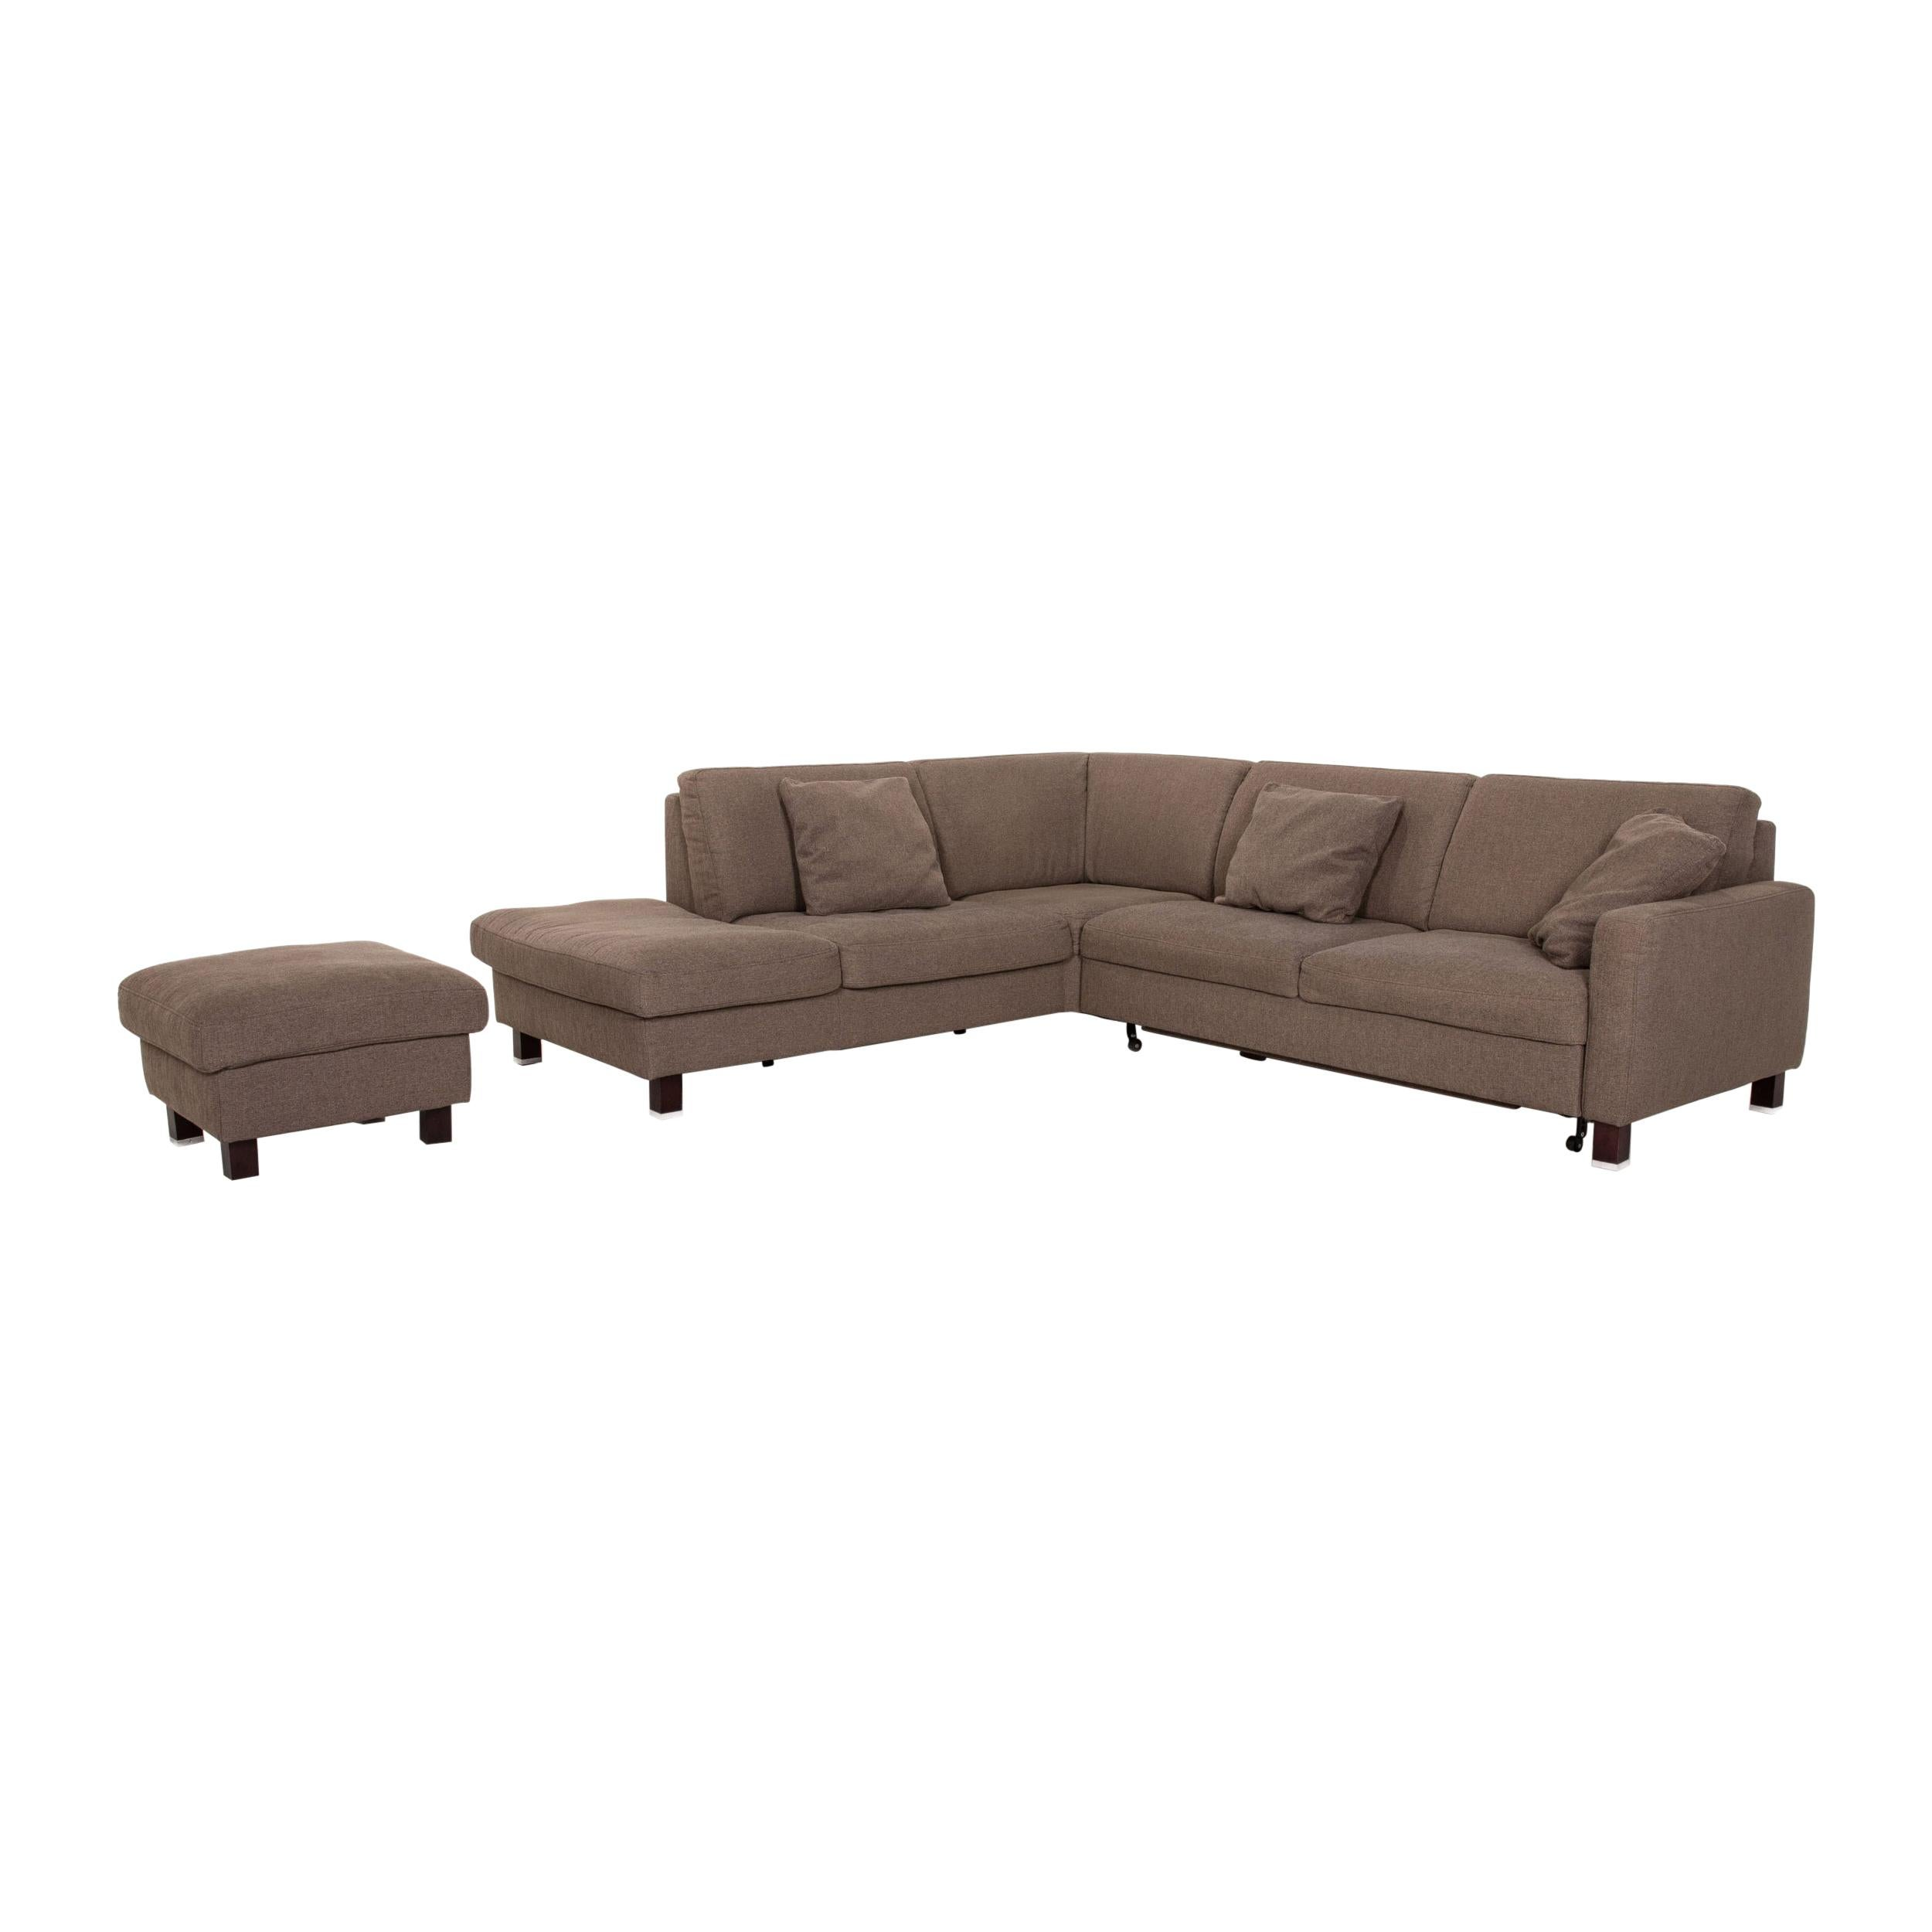 Ewald Schillig Fabric Sofa Set Gray Brown Function Sleeping Function Sofa Bed